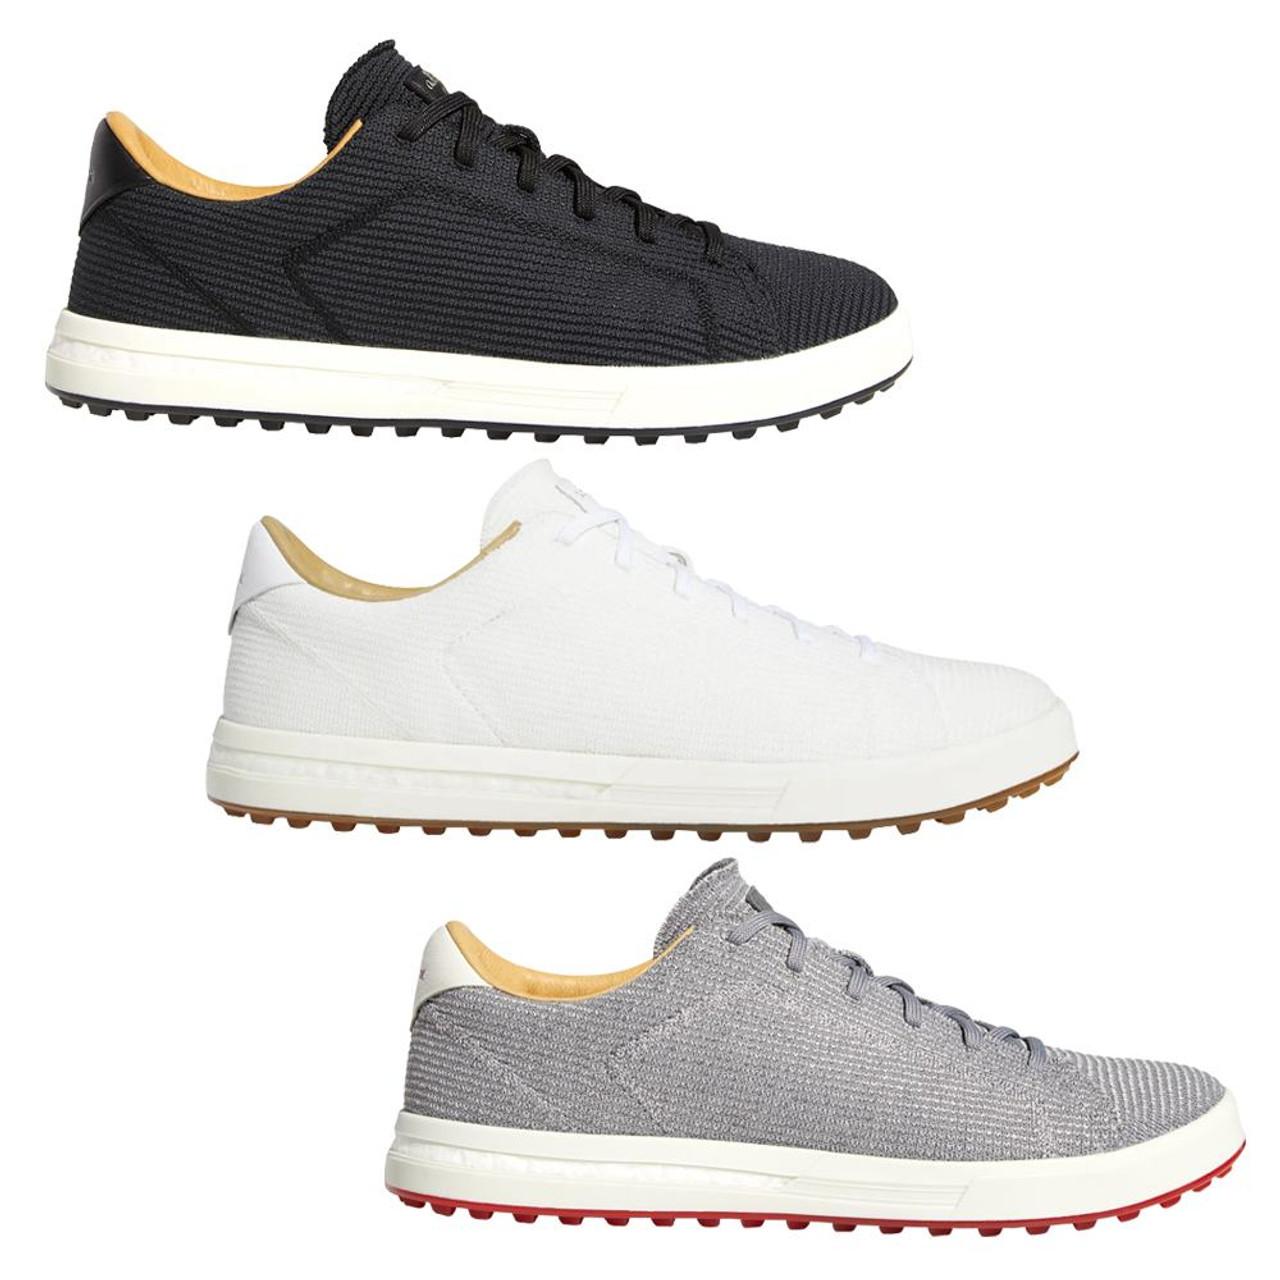 Adidas Adipure Spikeless Golf Shoes